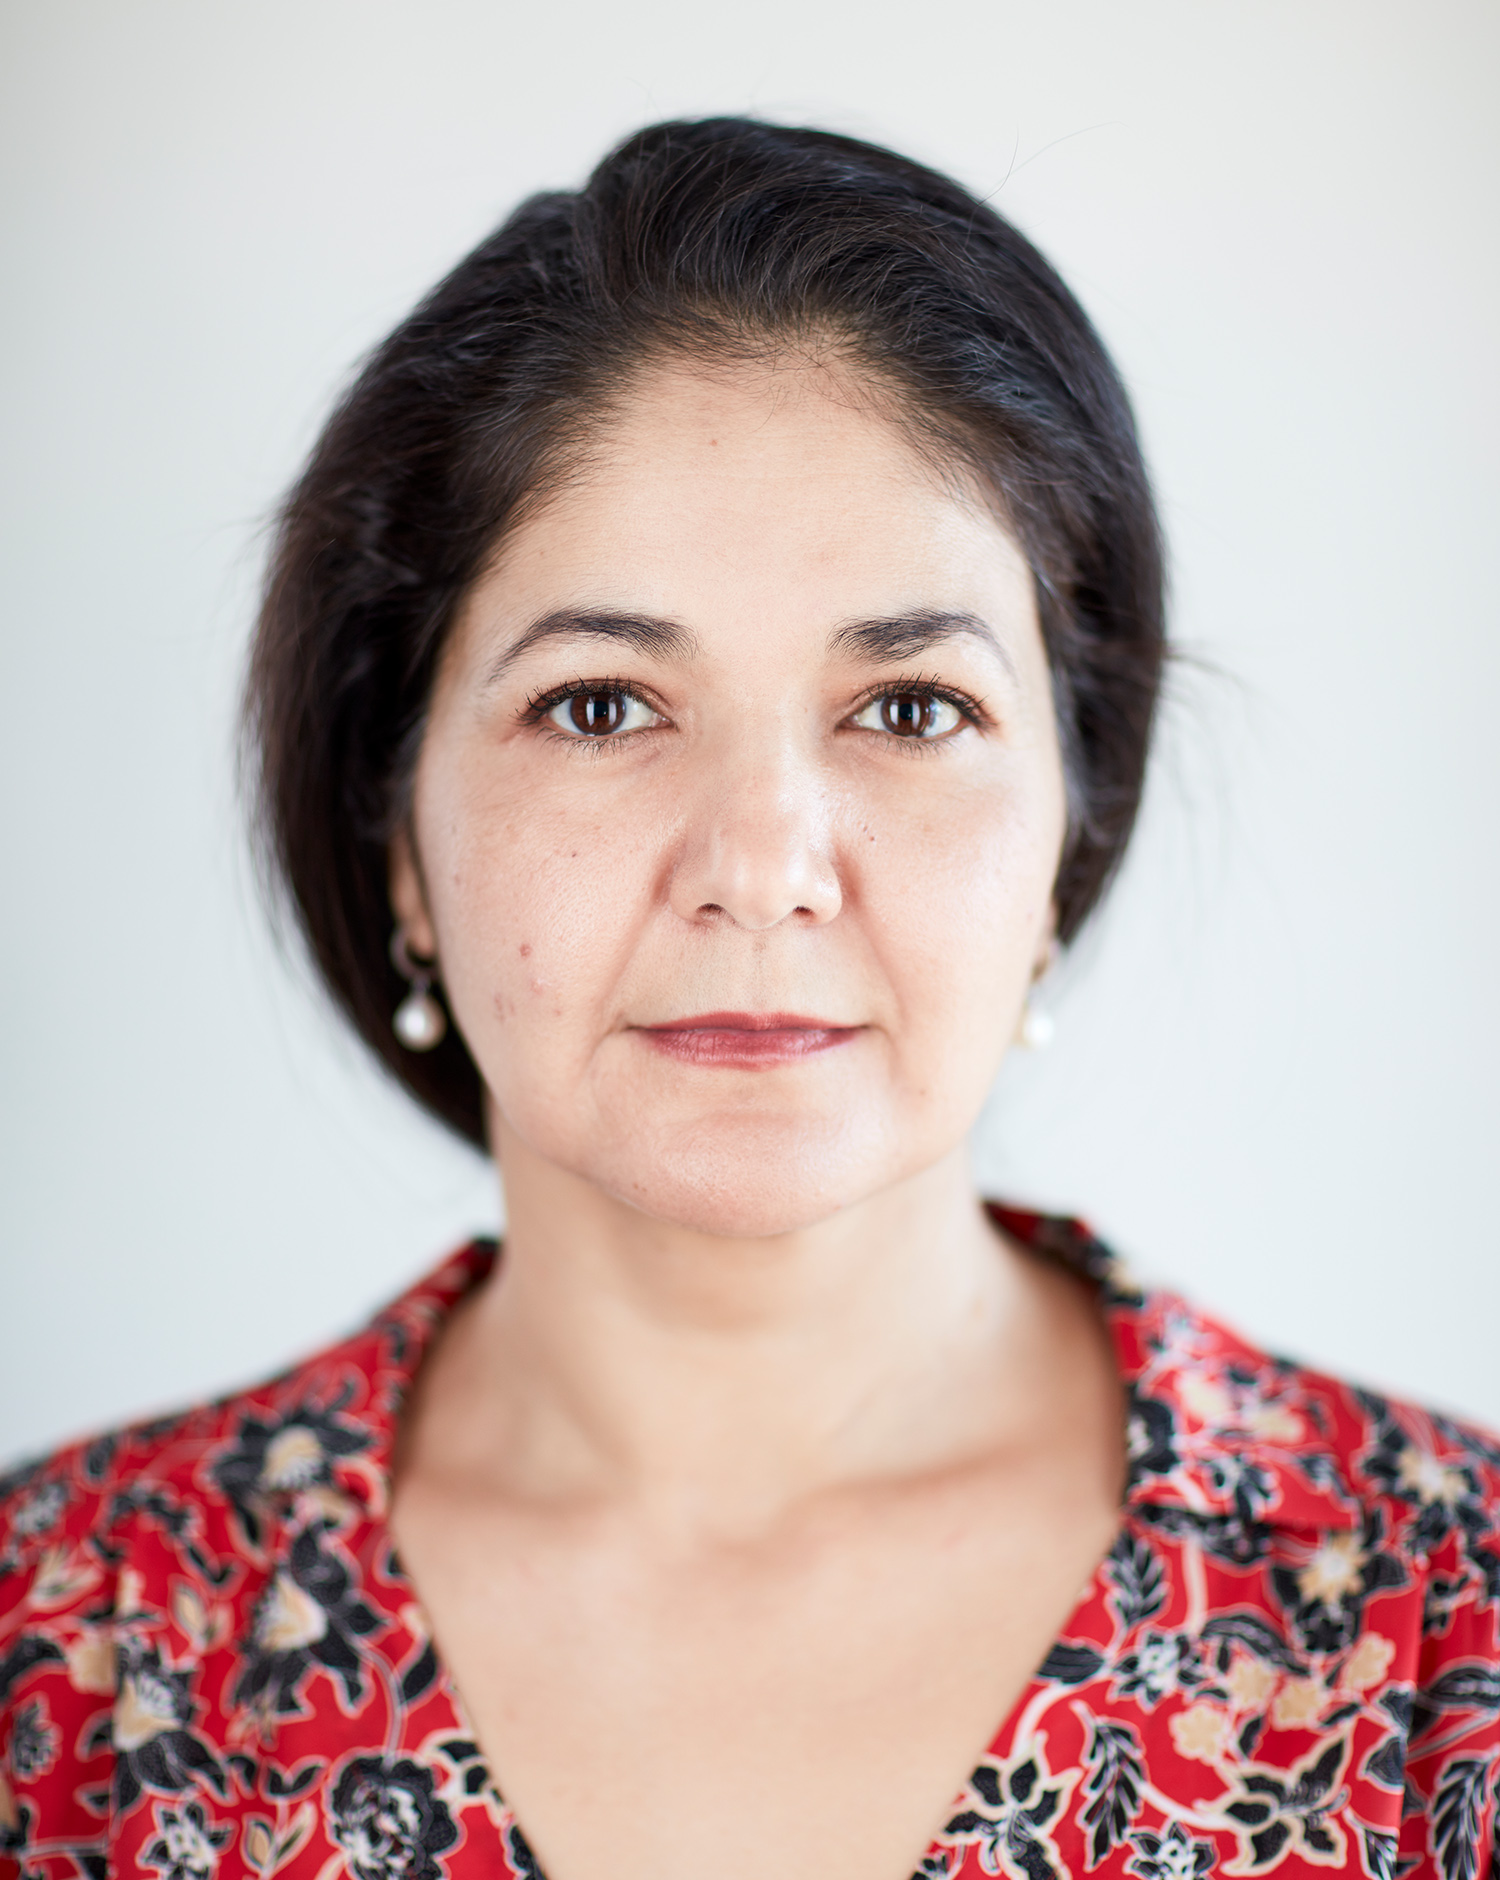 Vina Nadjibulla (Photograph by Eric Putz)